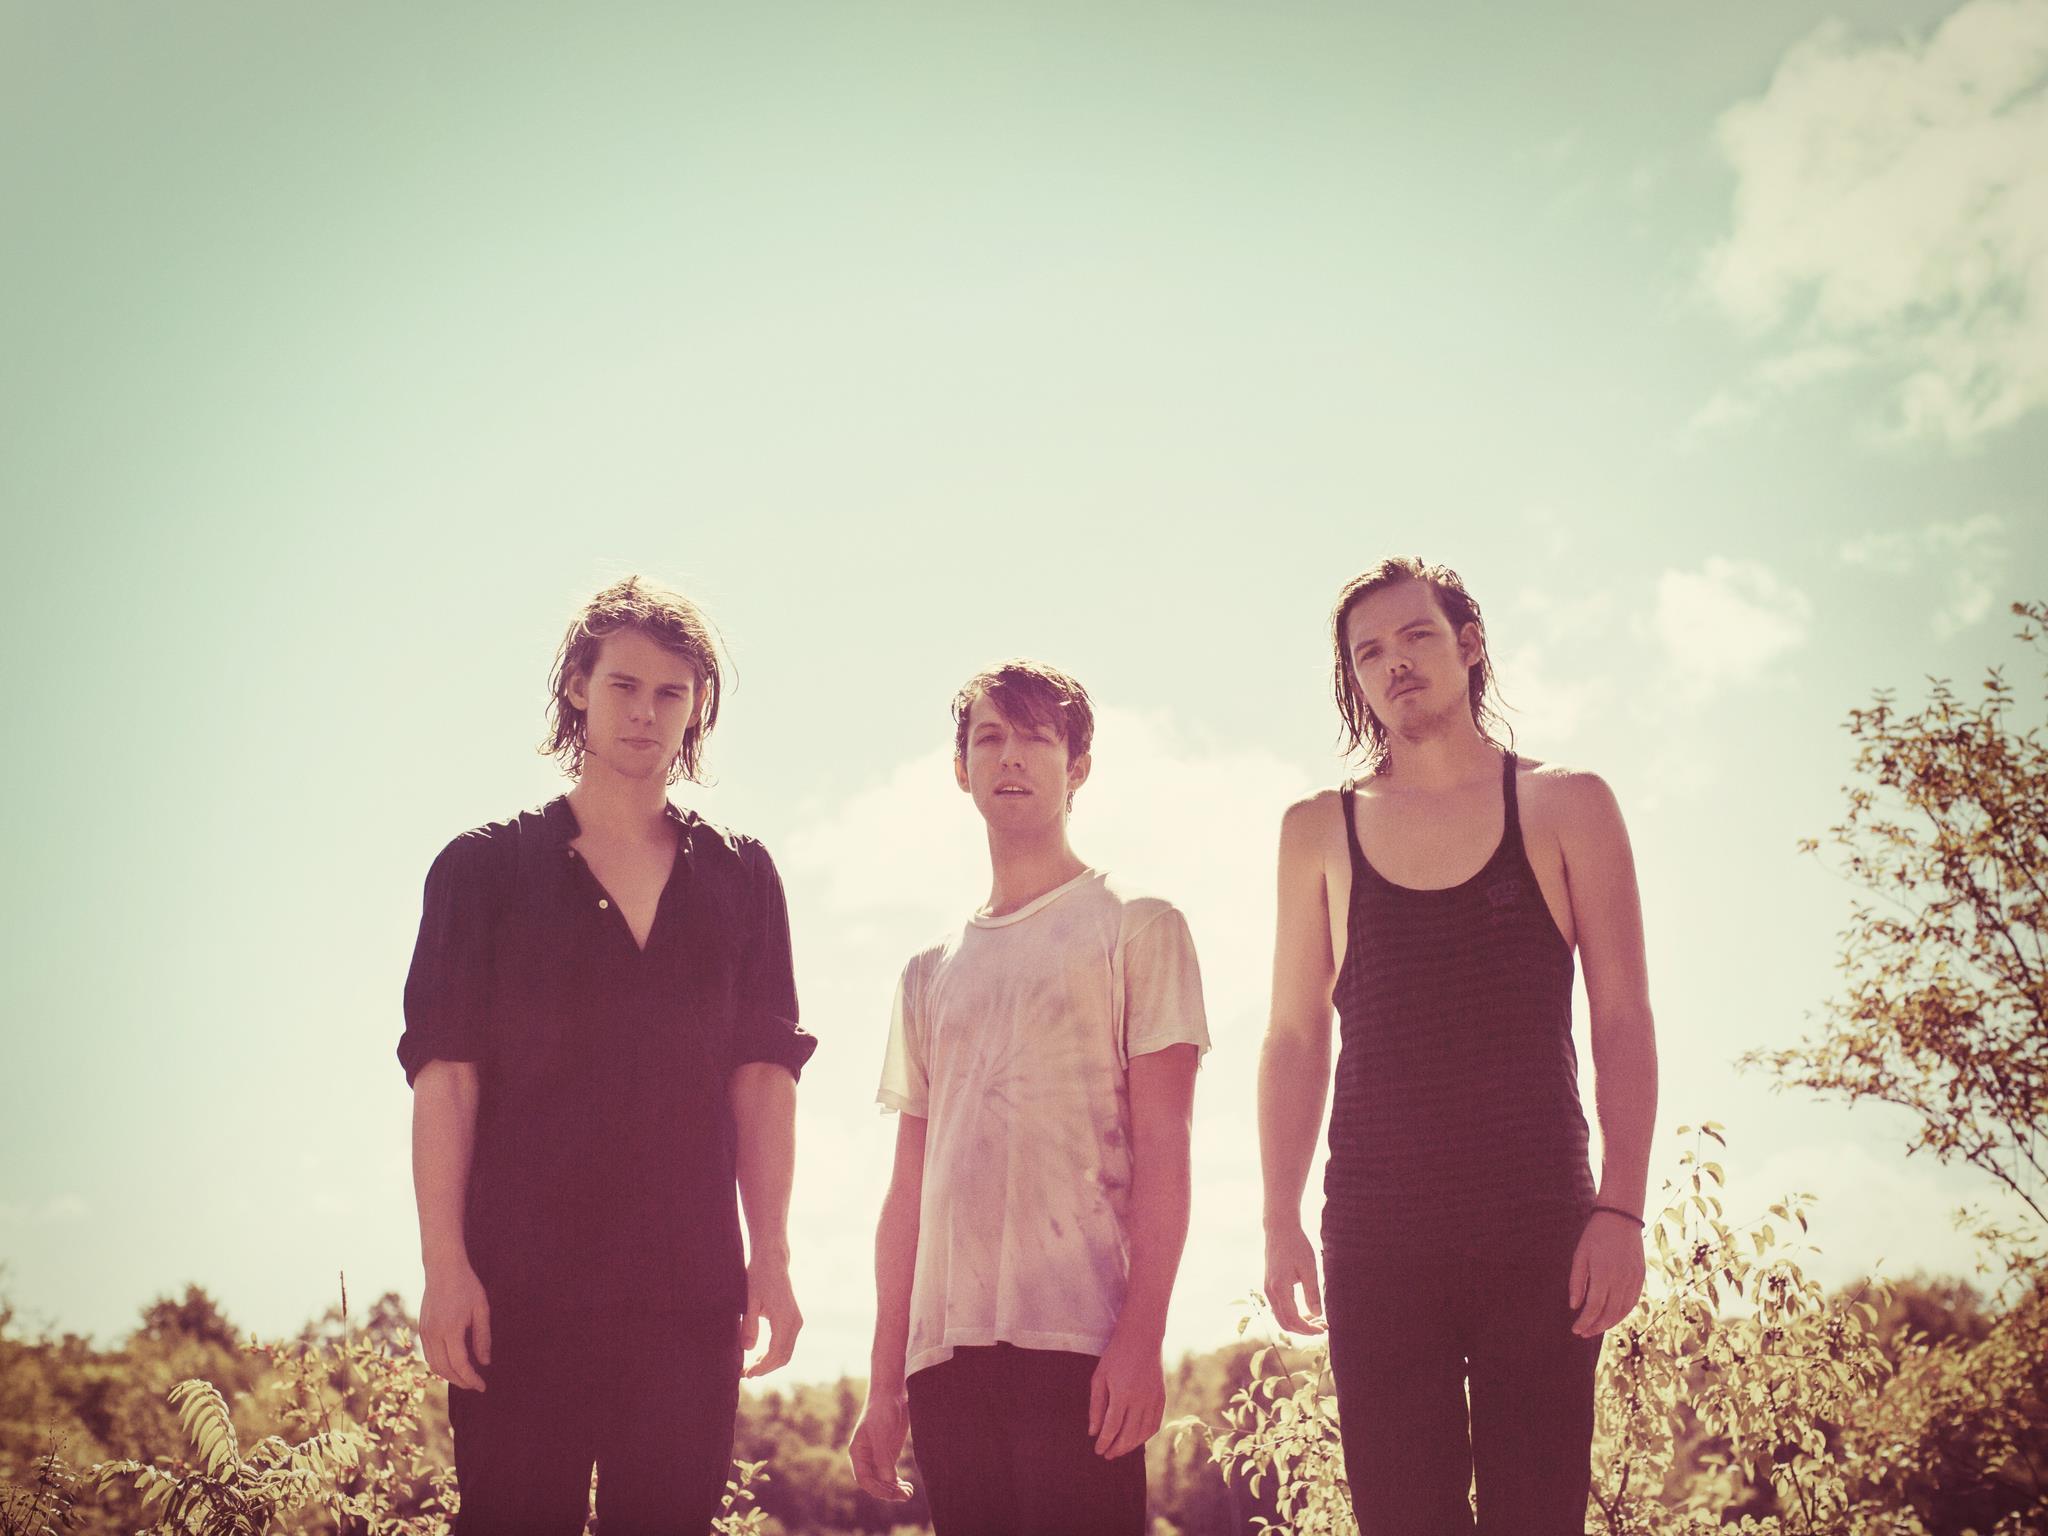 Live Review: Half Moon Run // Brudenell Social Club, Leeds, 30.10.15